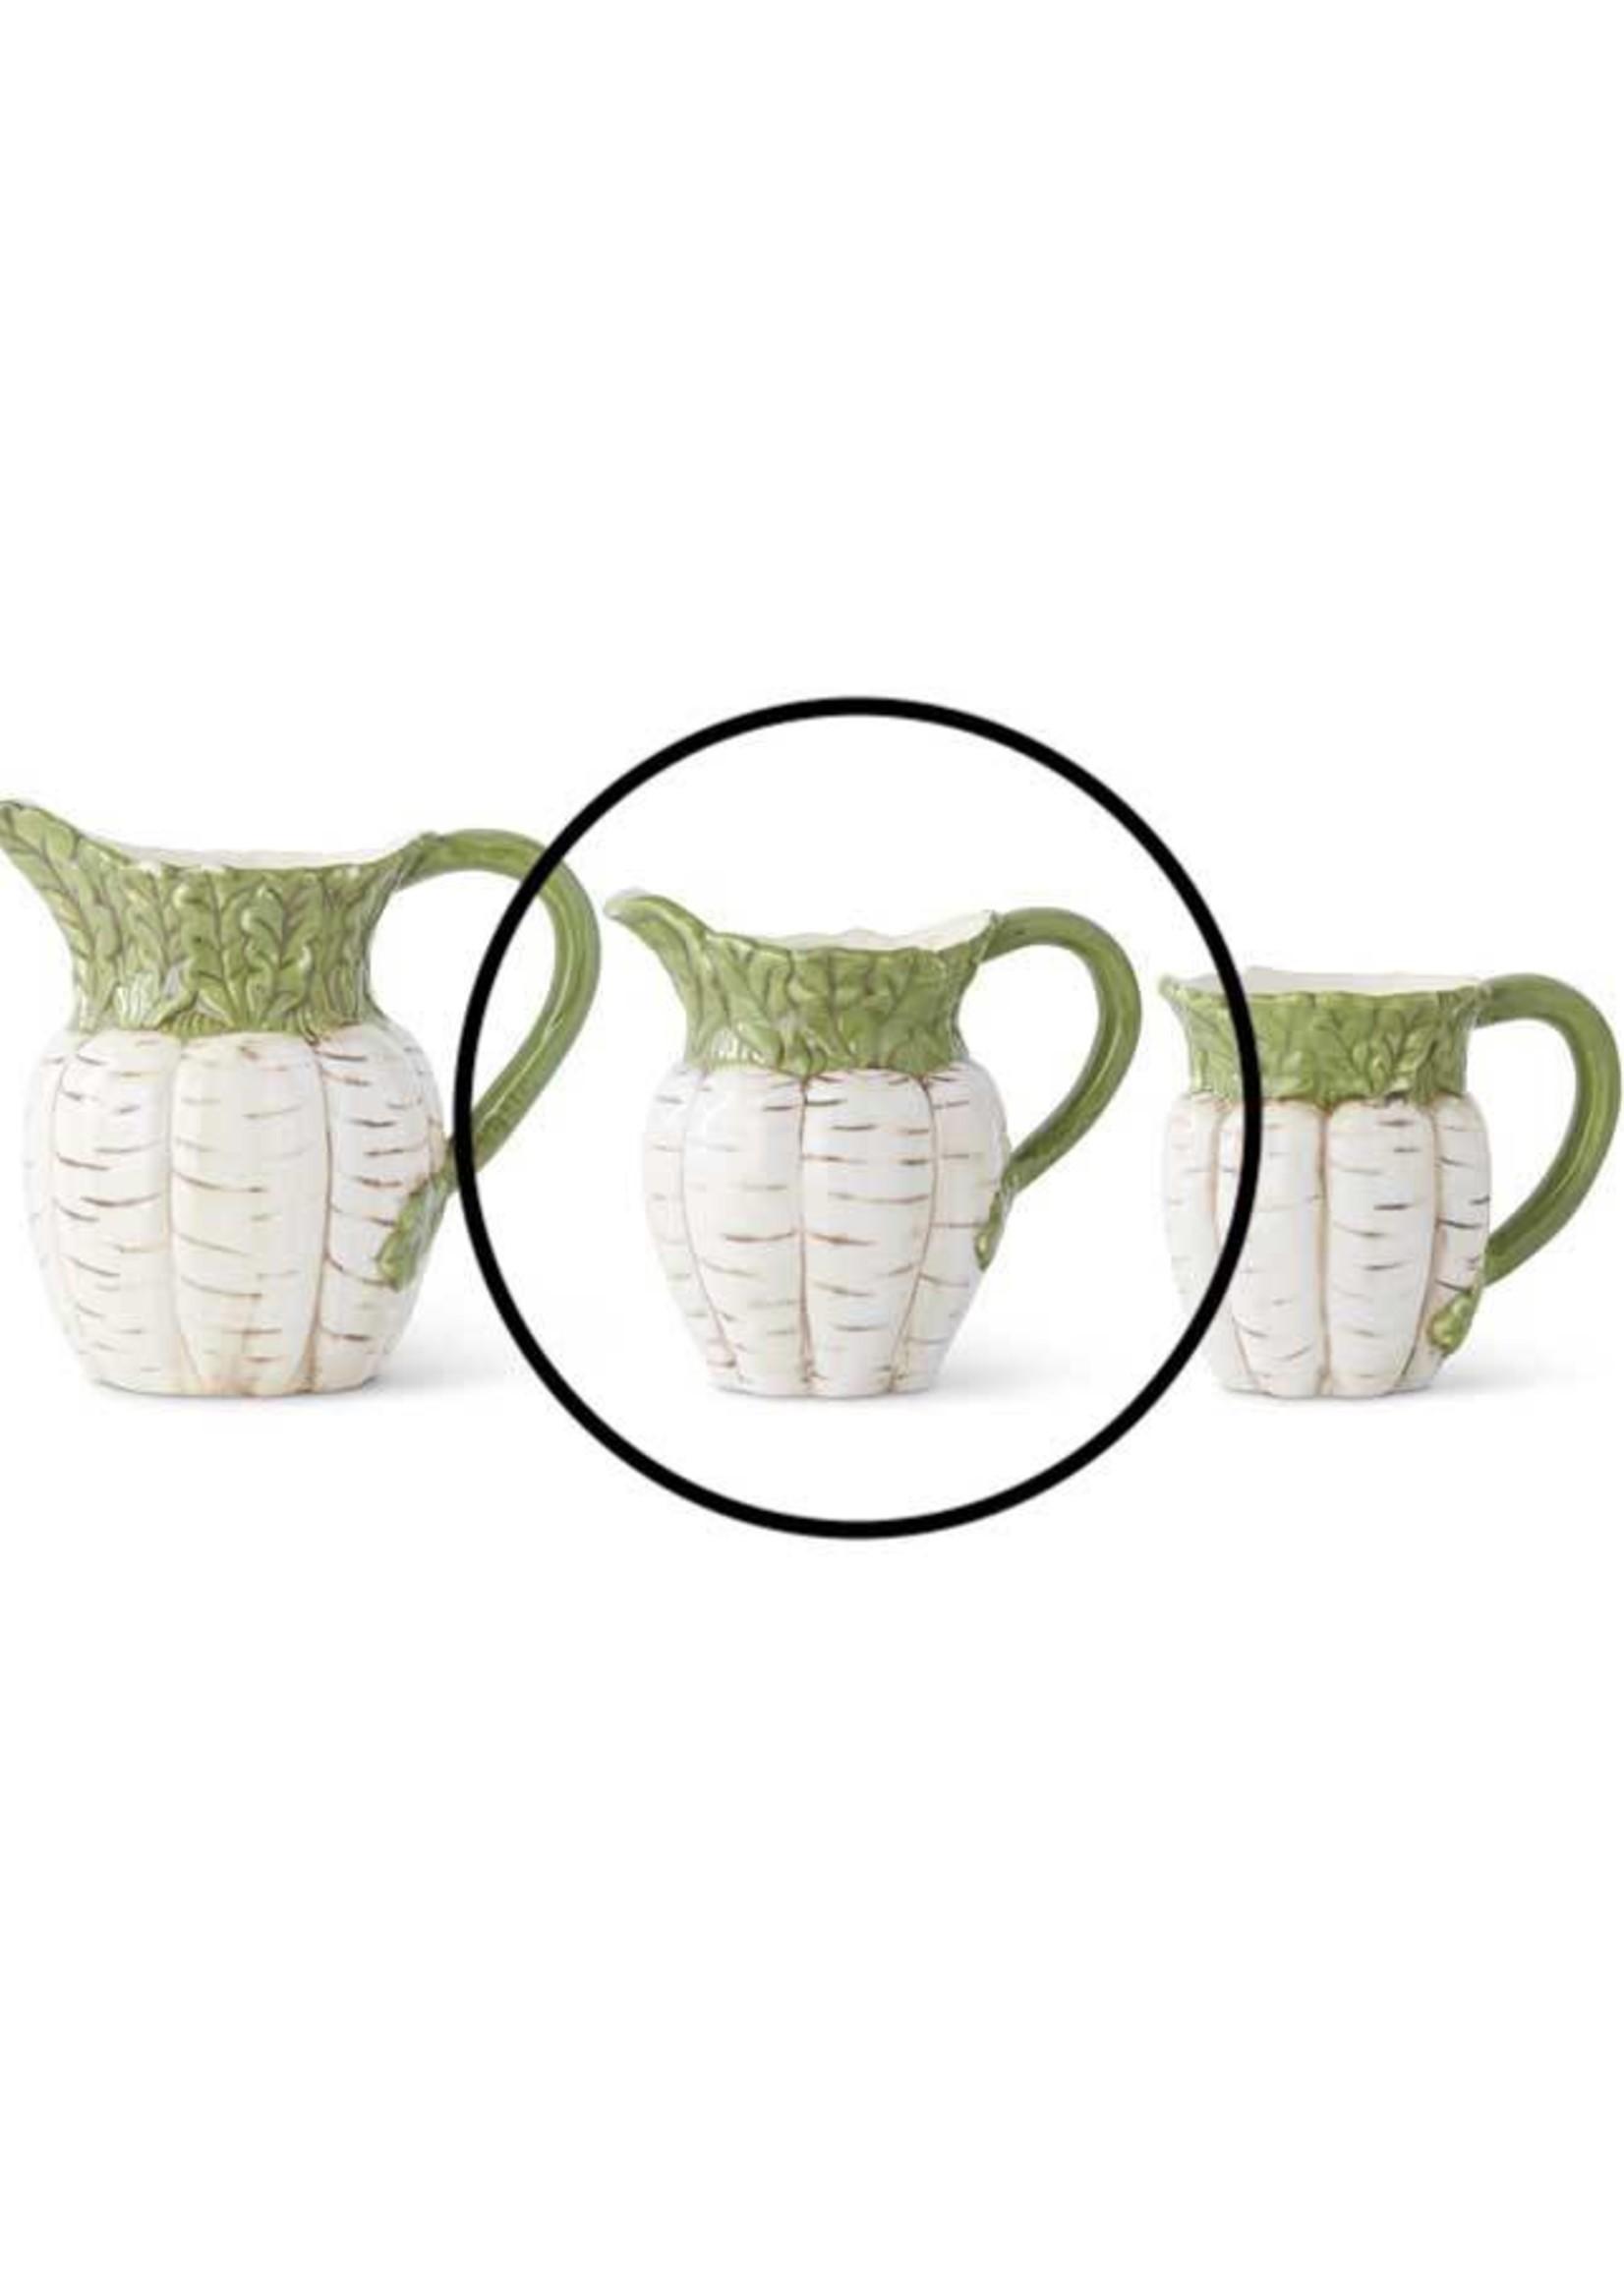 "K & K Interiors 7.25"" Ceramic White Carrot Pither w/ Green Top"